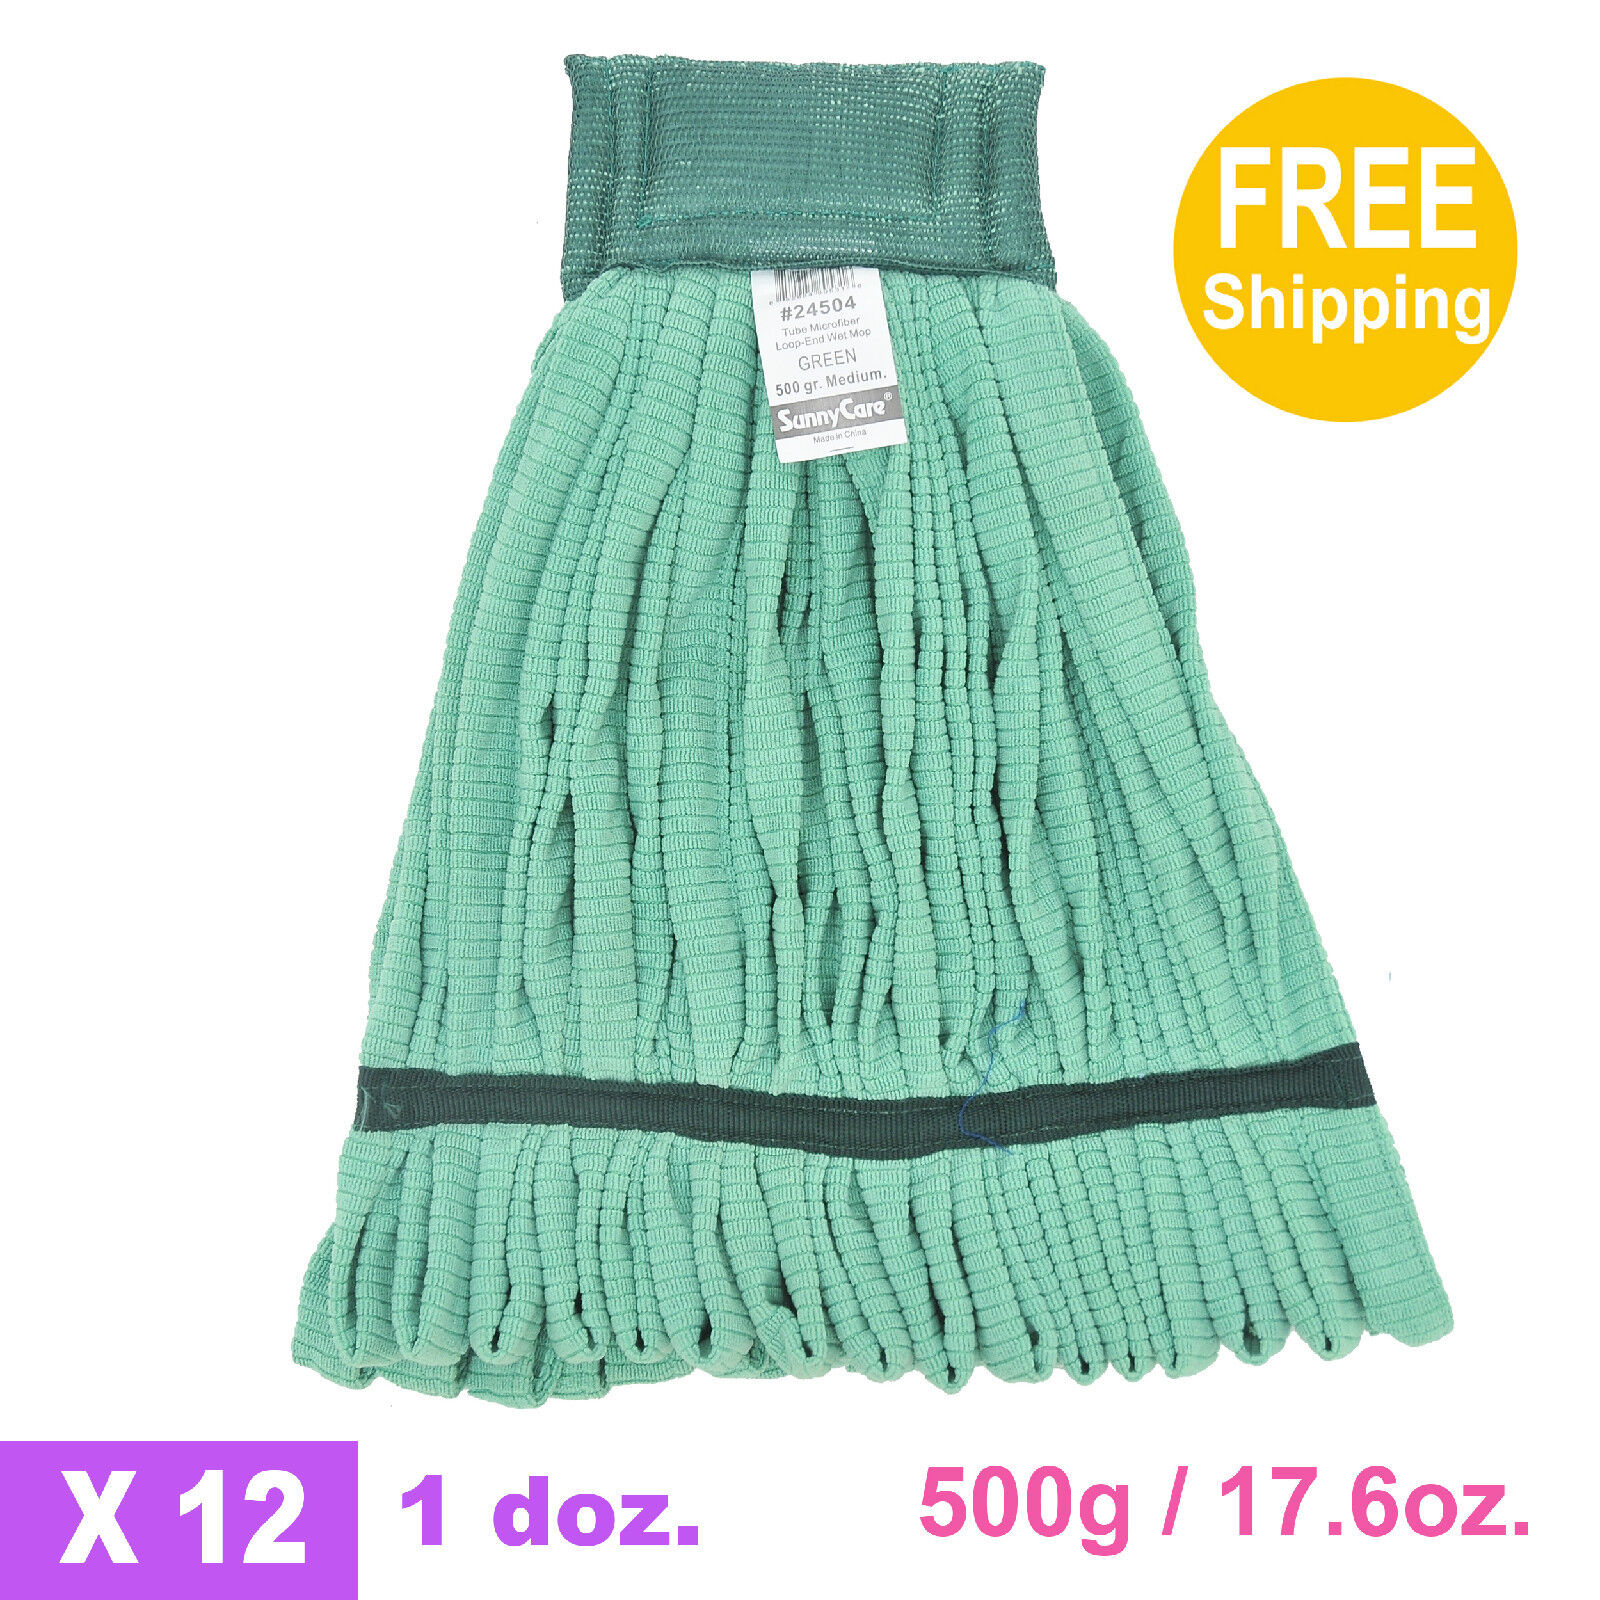 1doz. 500g 17.6oz. SunnyCare Green Tube Microfiber Loop-End Wet Mop 12 CS